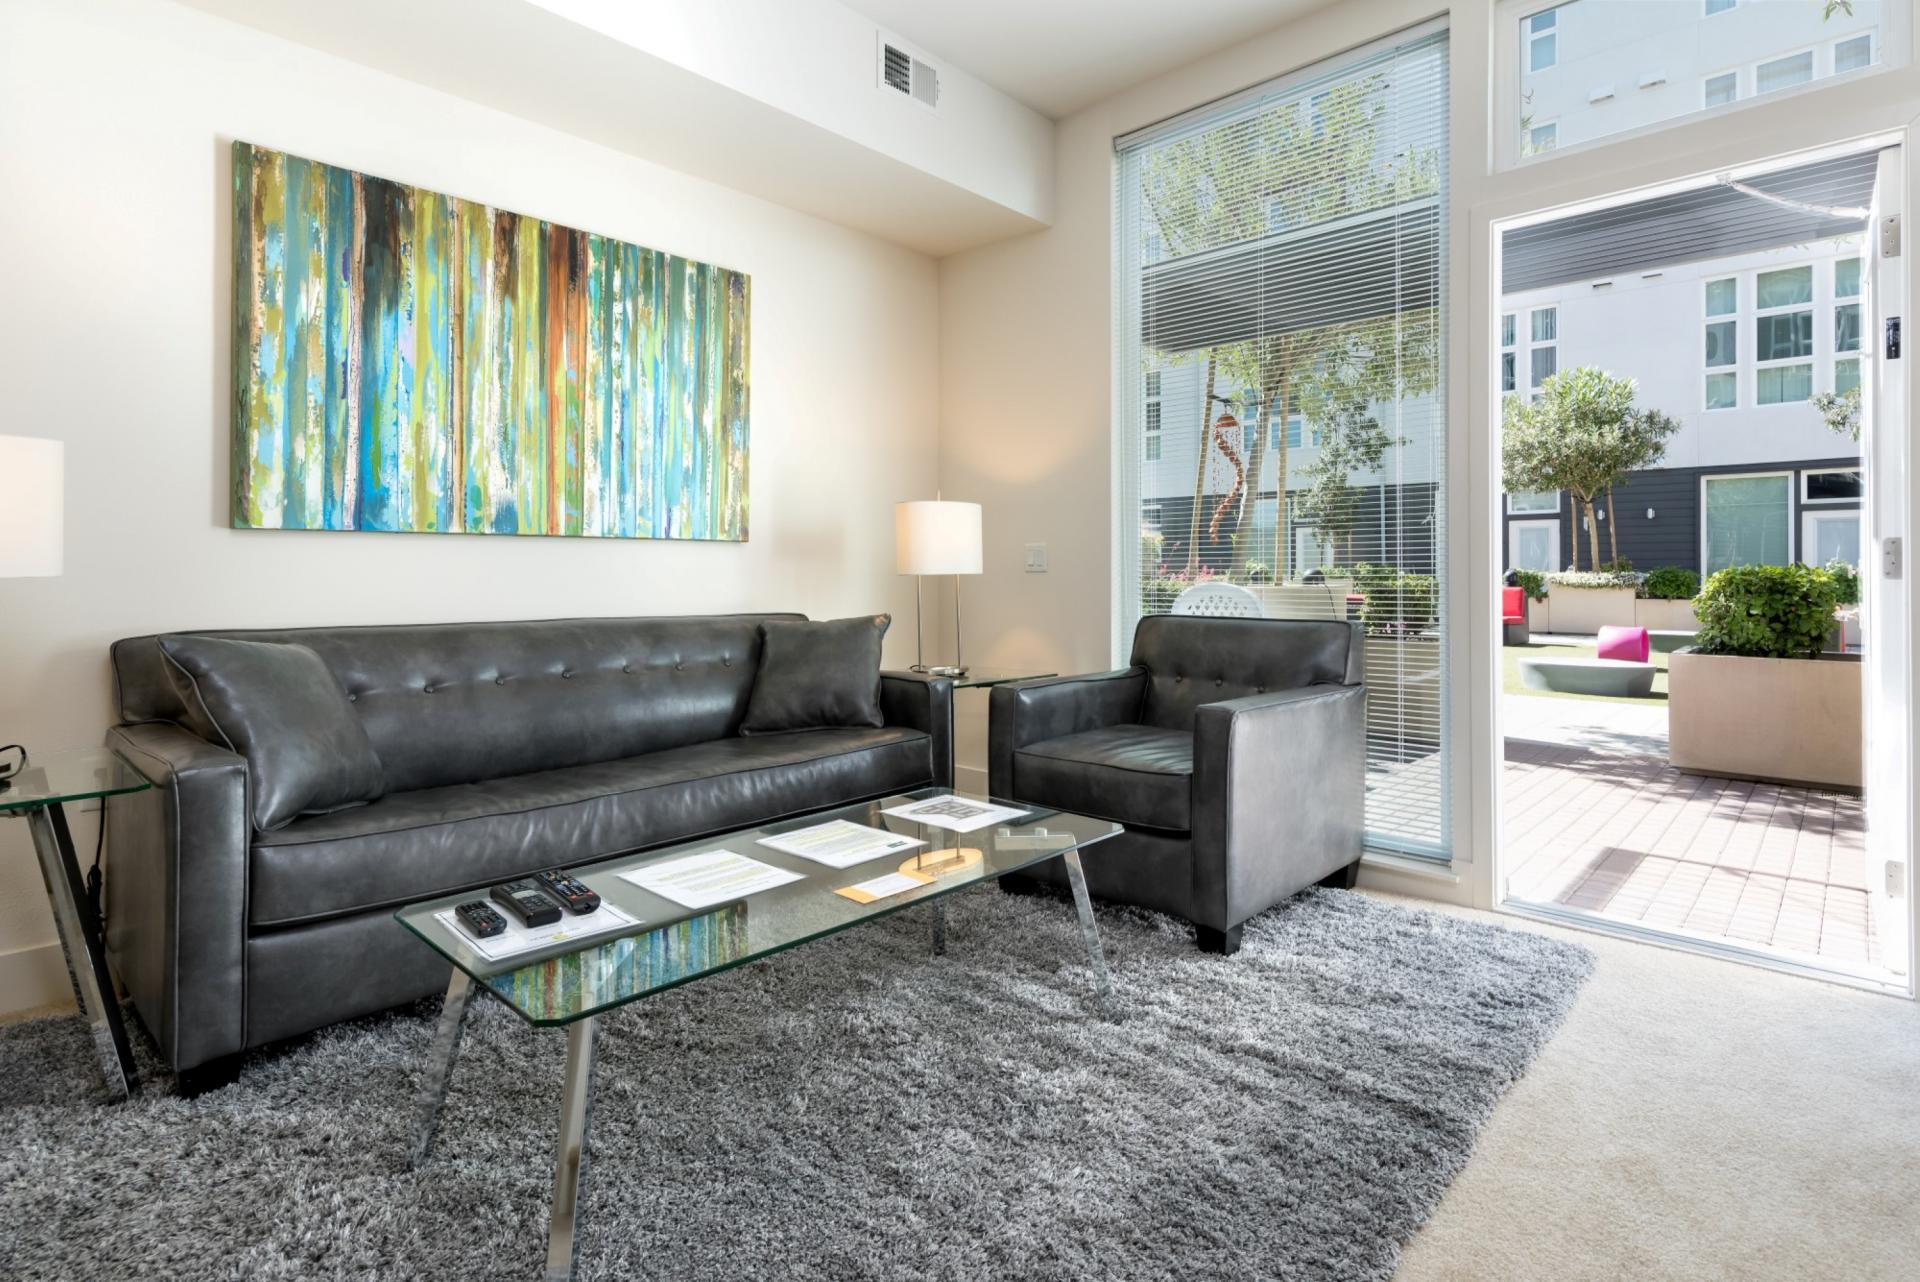 Sofa at The Domain Apartments, Renaisance, San Jose